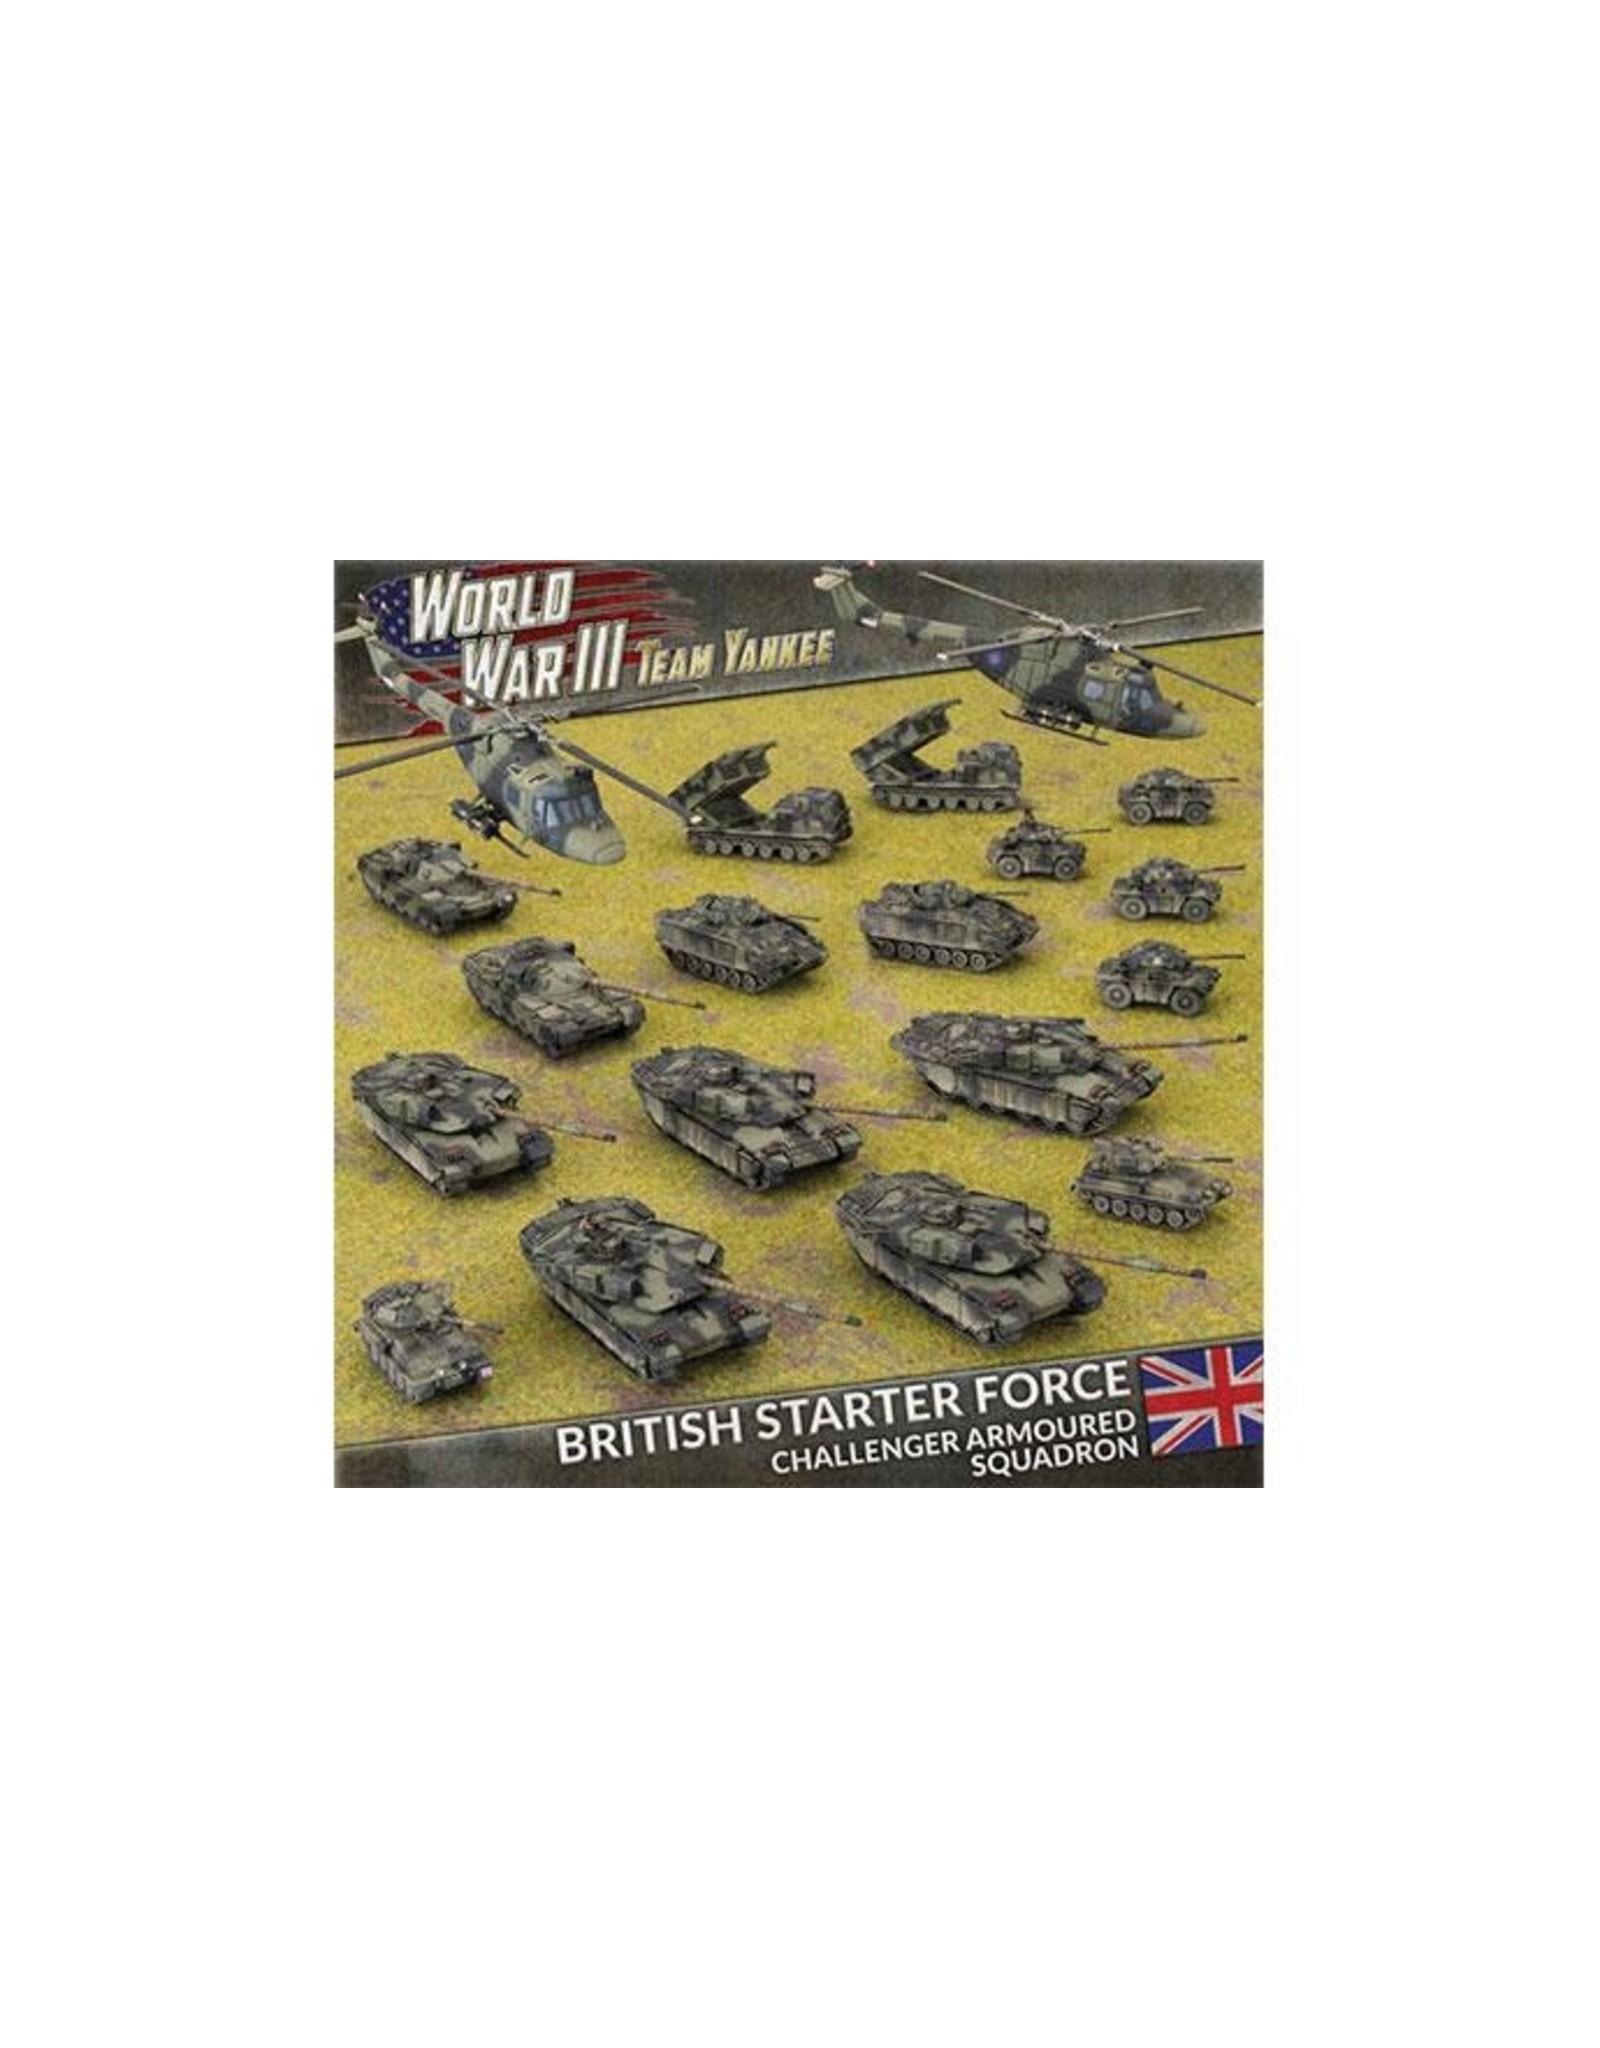 Team Yankee Team Yankee: British Starter Force - Challenger Armoured Squadron